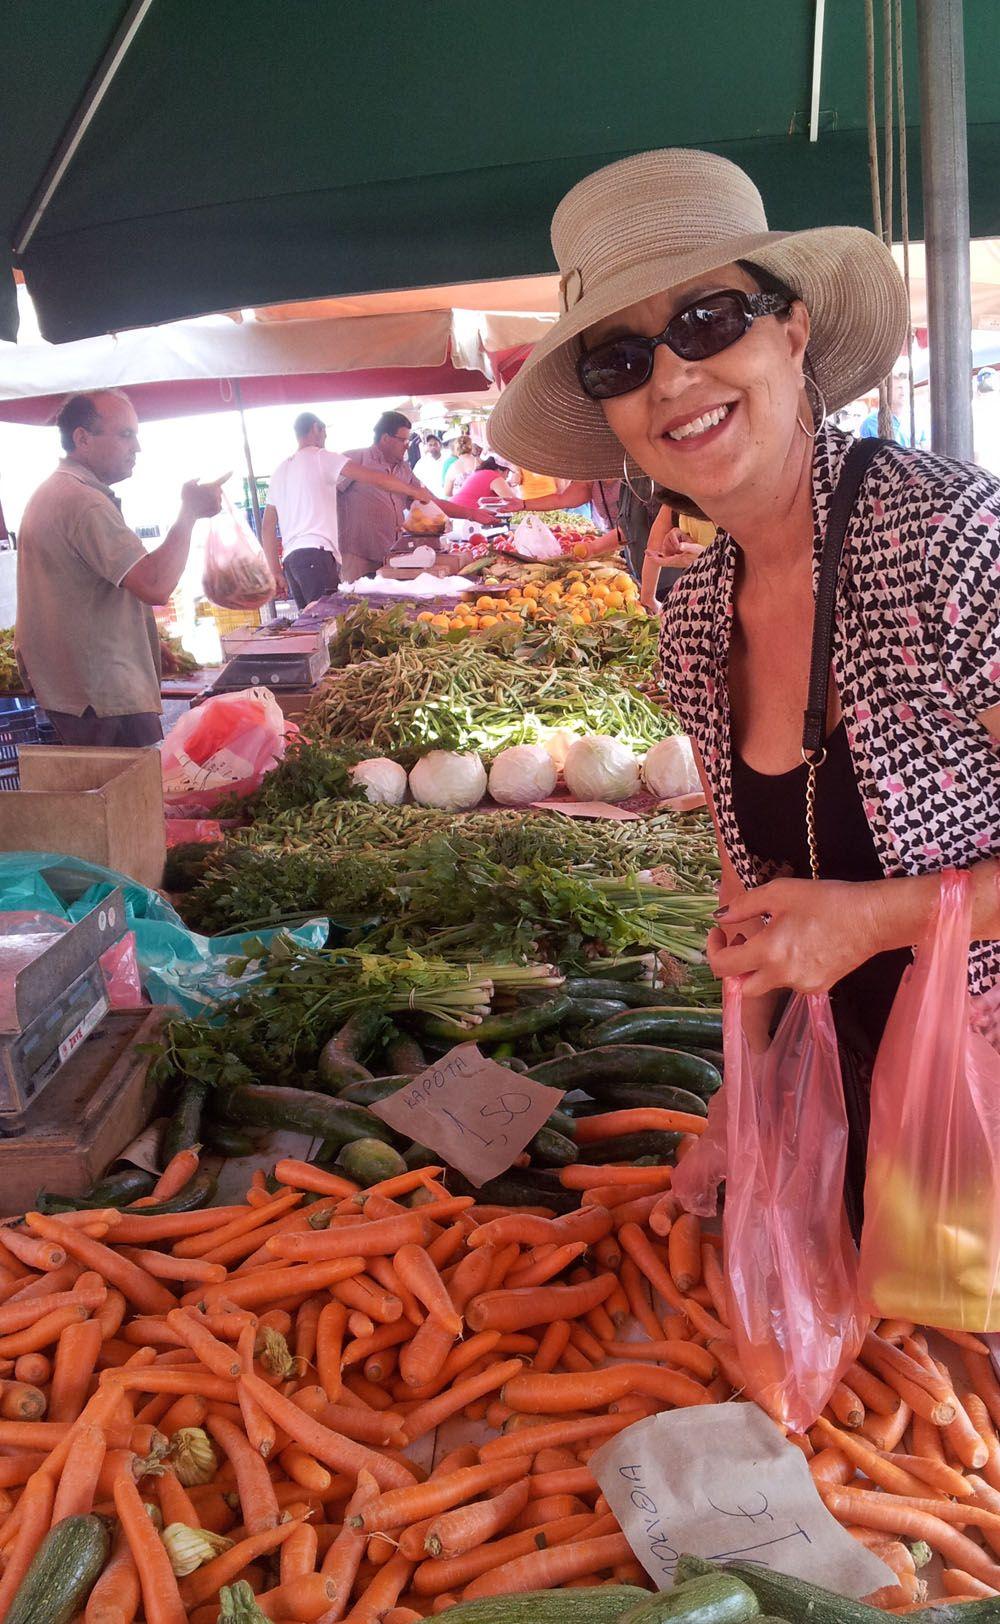 Lifestyle market day in ermioni greece food europe